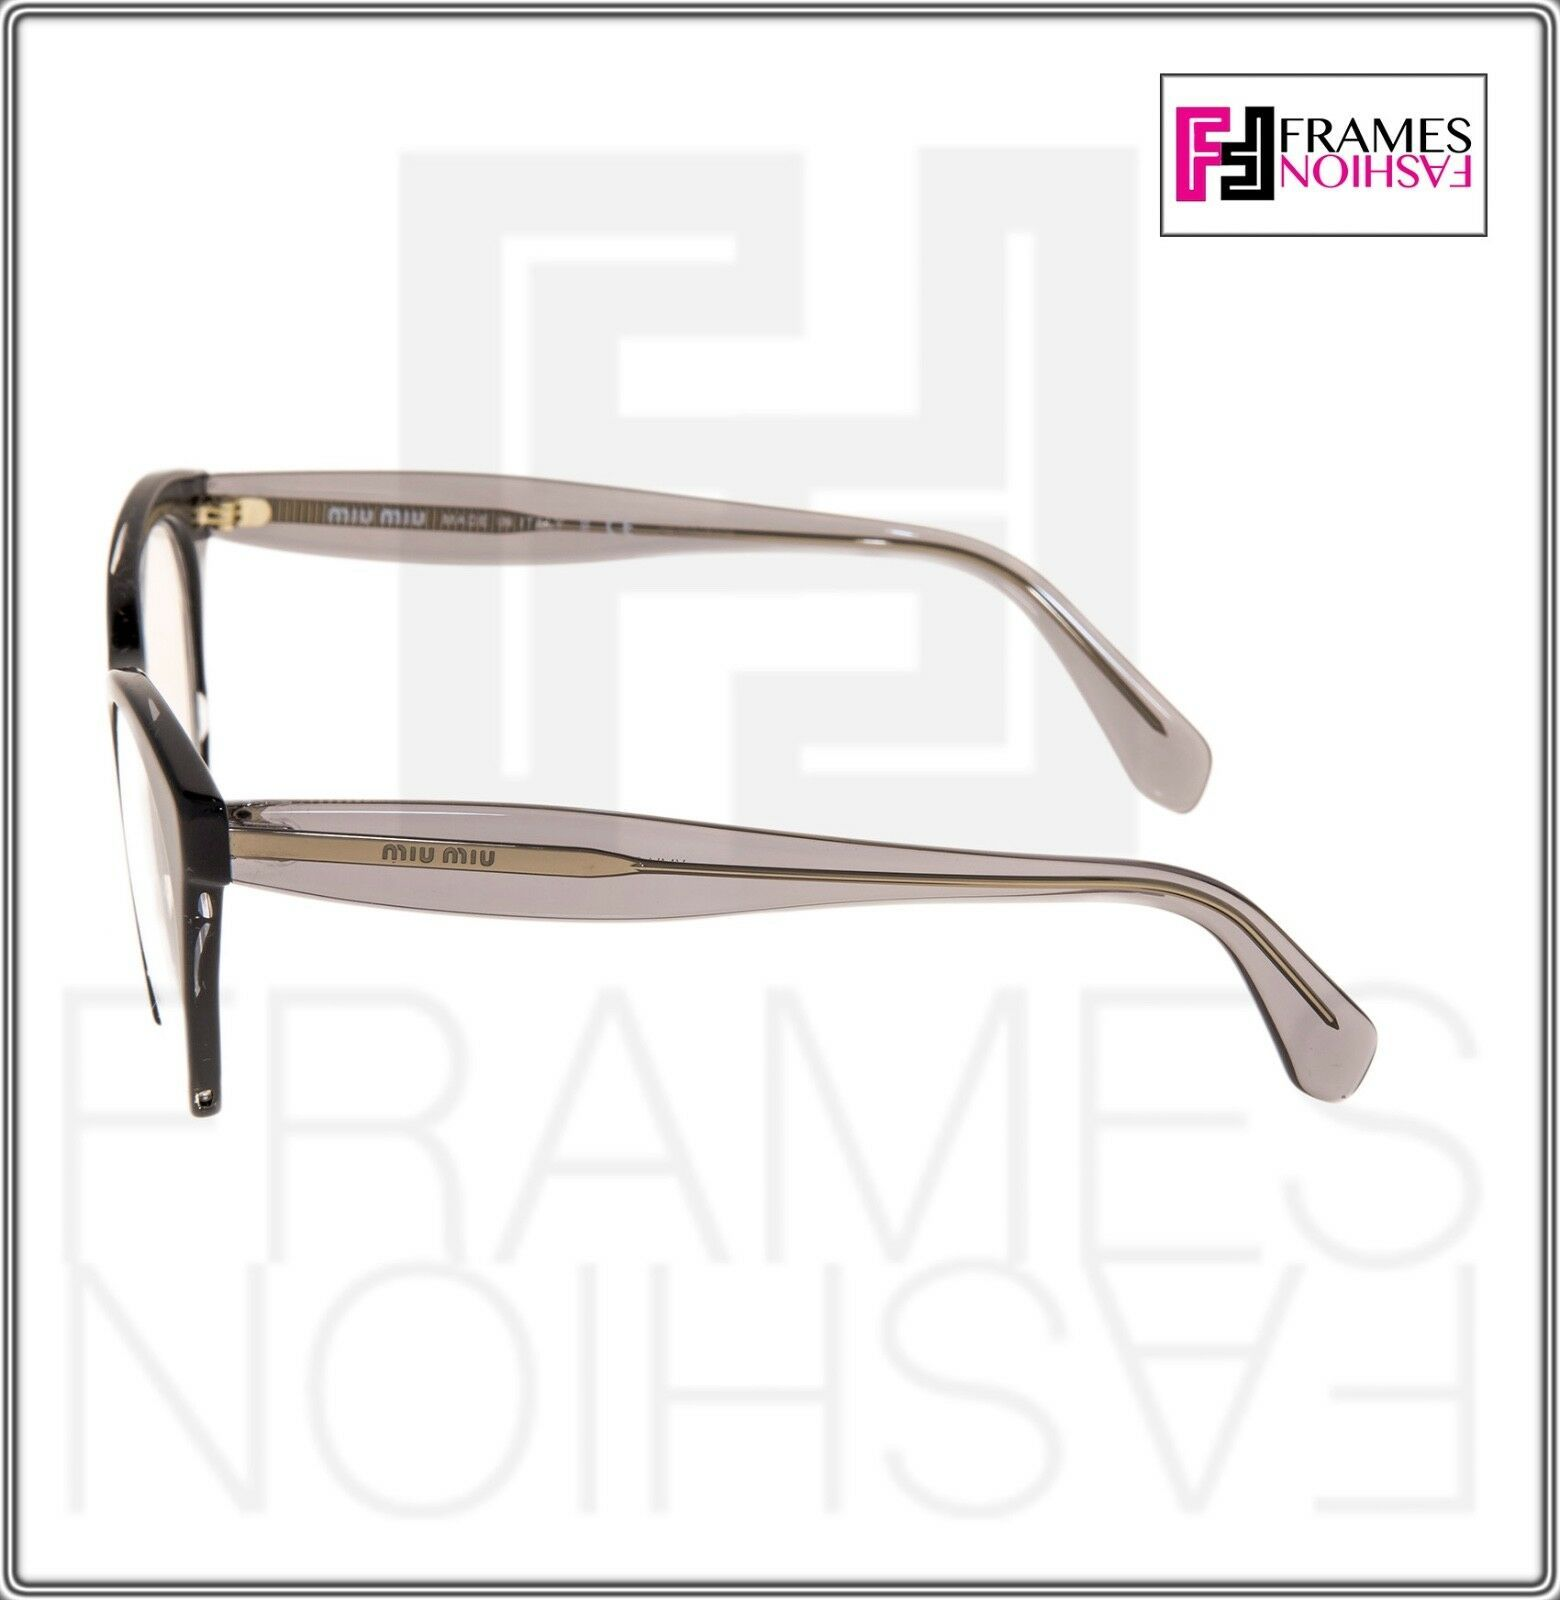 MIU MIU RASOIR MU03QV Eyeglasses Optical Frame Black Grey Translucent 51mm 03Q image 2